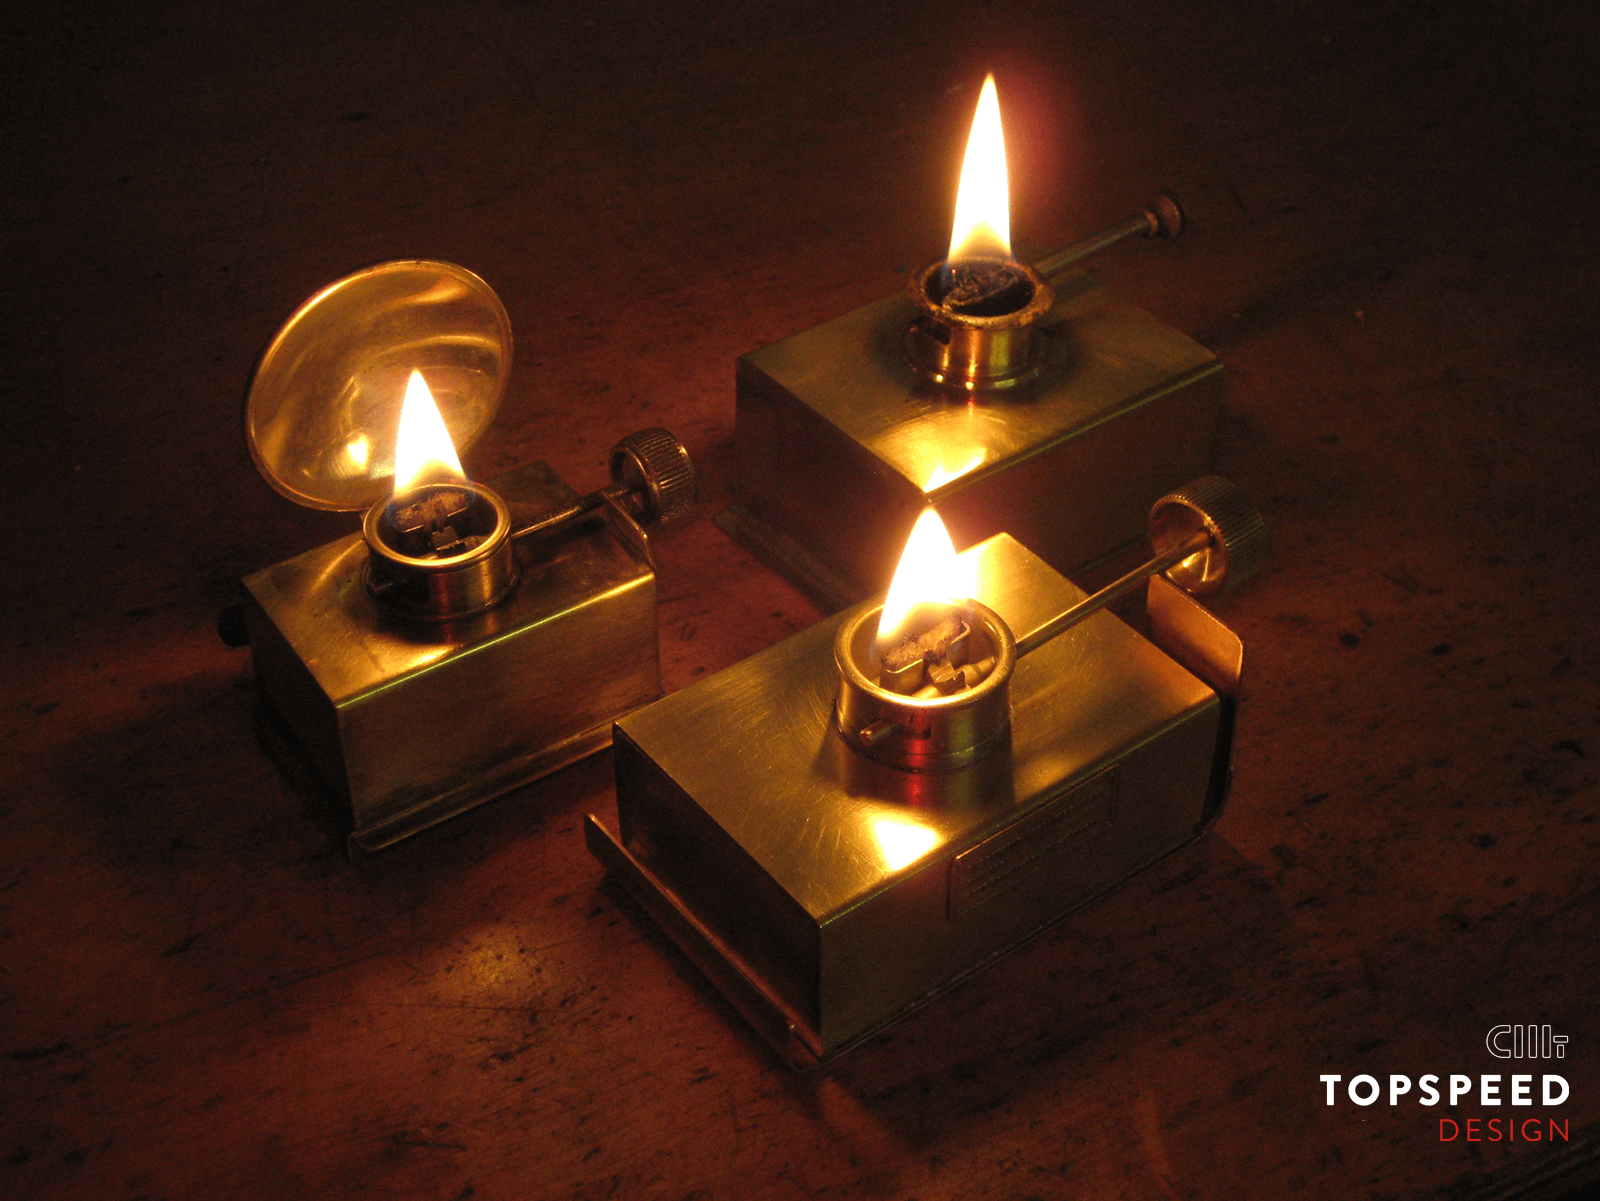 Öllampen | Topspeed Design by Bxernhard Schmidt